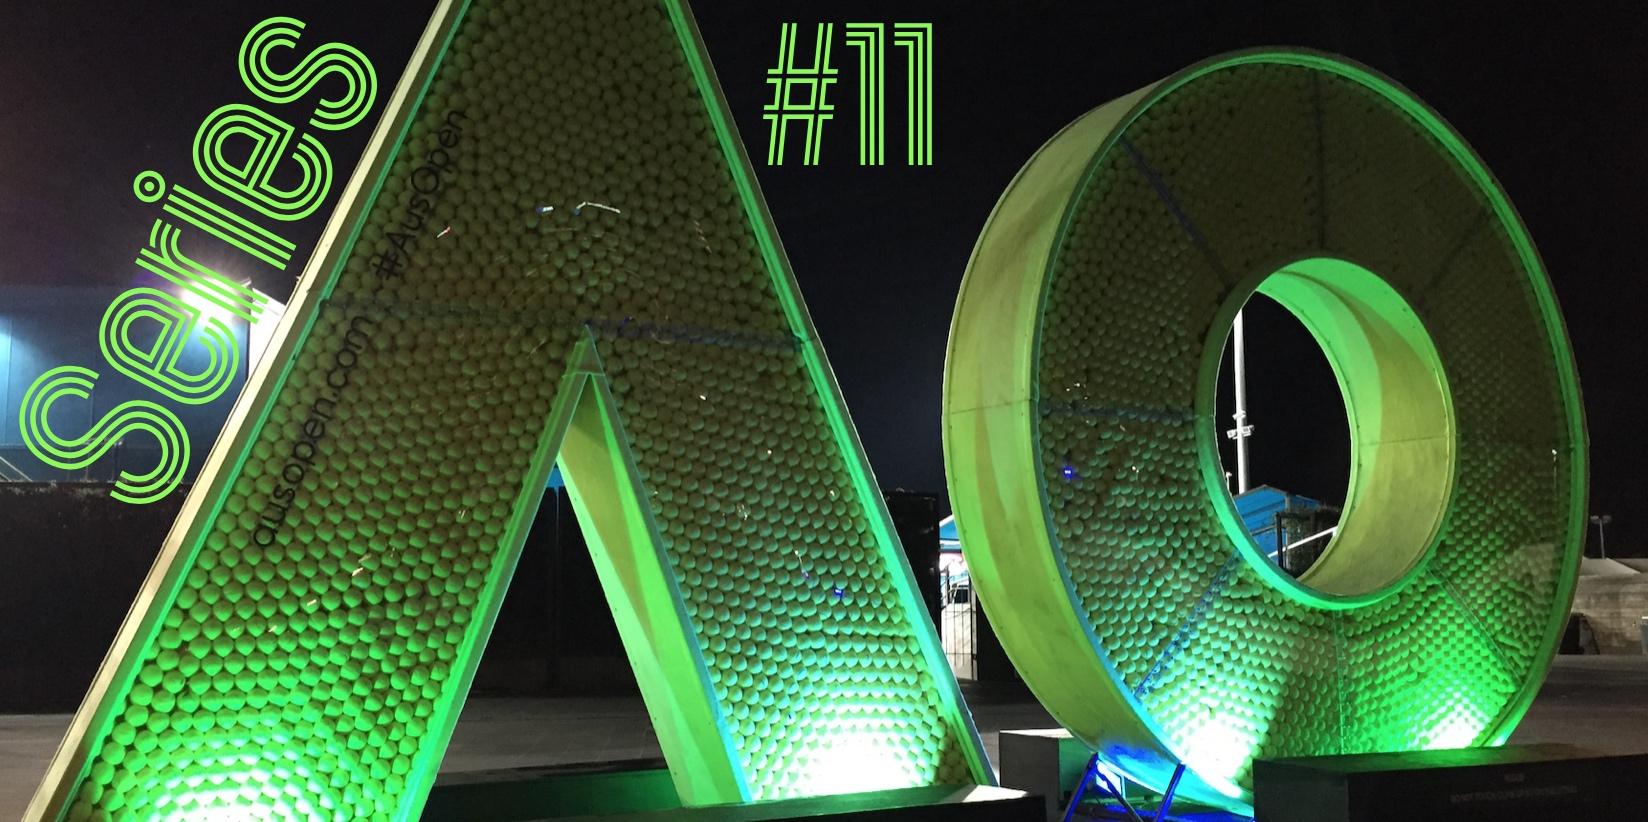 Australian Open Series #11 - settesei.it